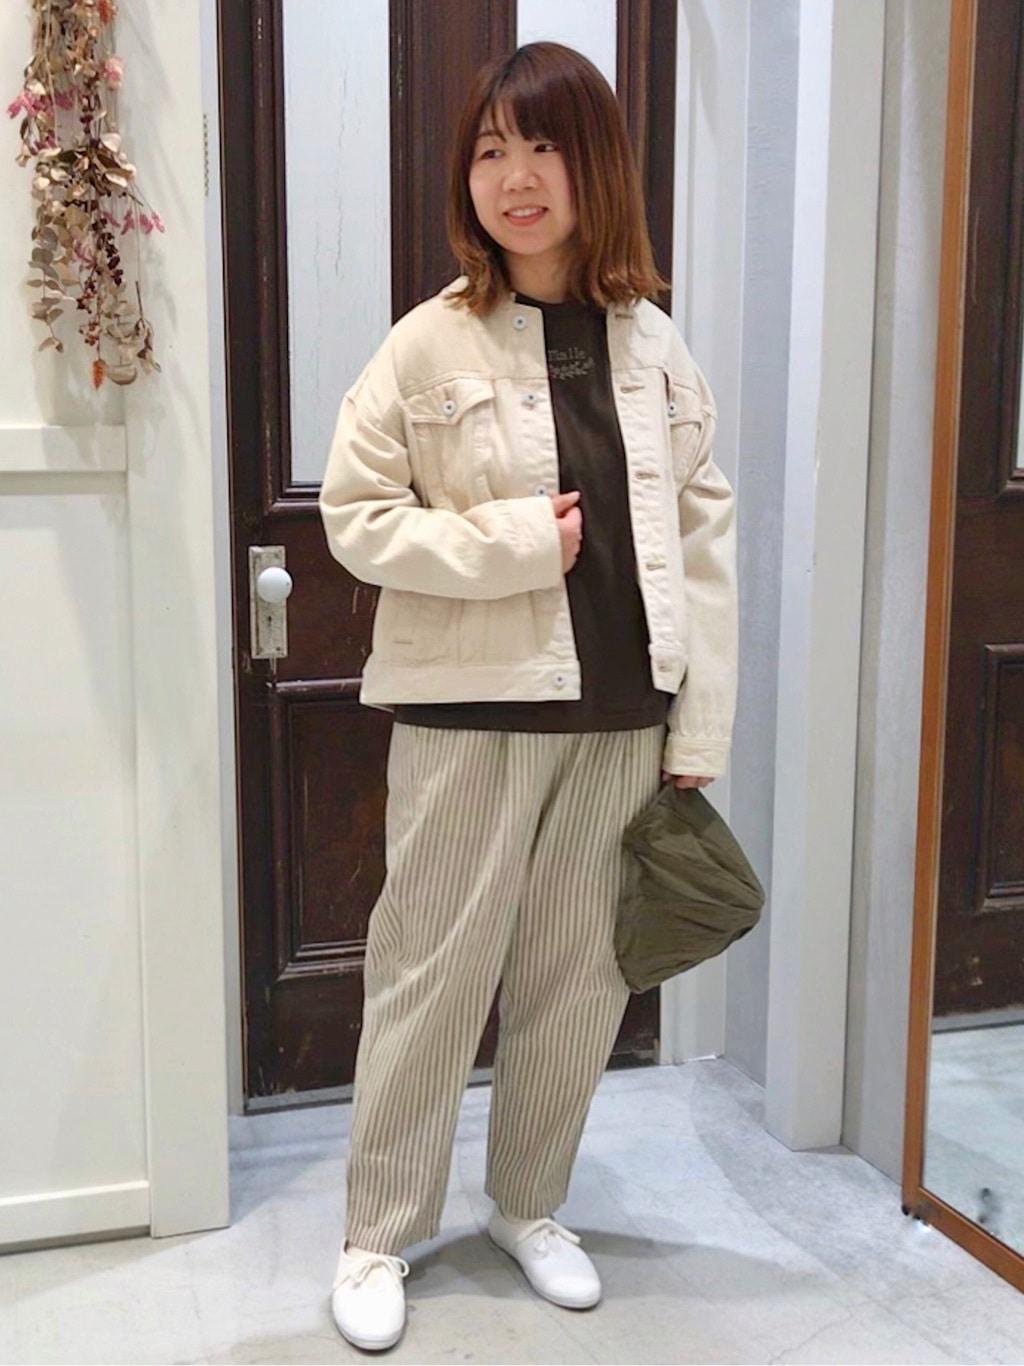 chambre de charme キラリナ京王吉祥寺 身長:155cm 2021.03.30